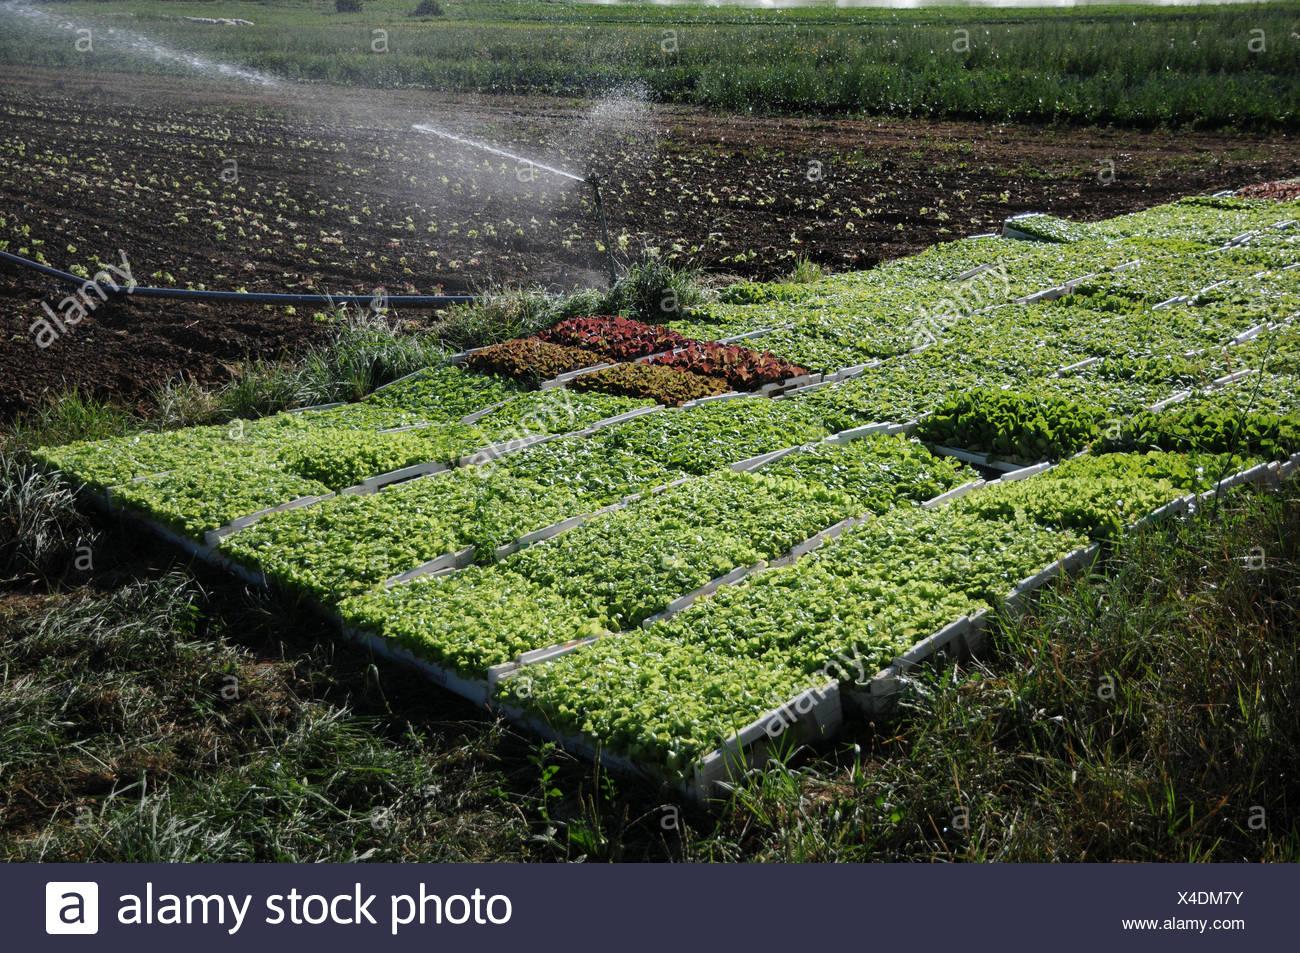 Lettuce - Stock Image